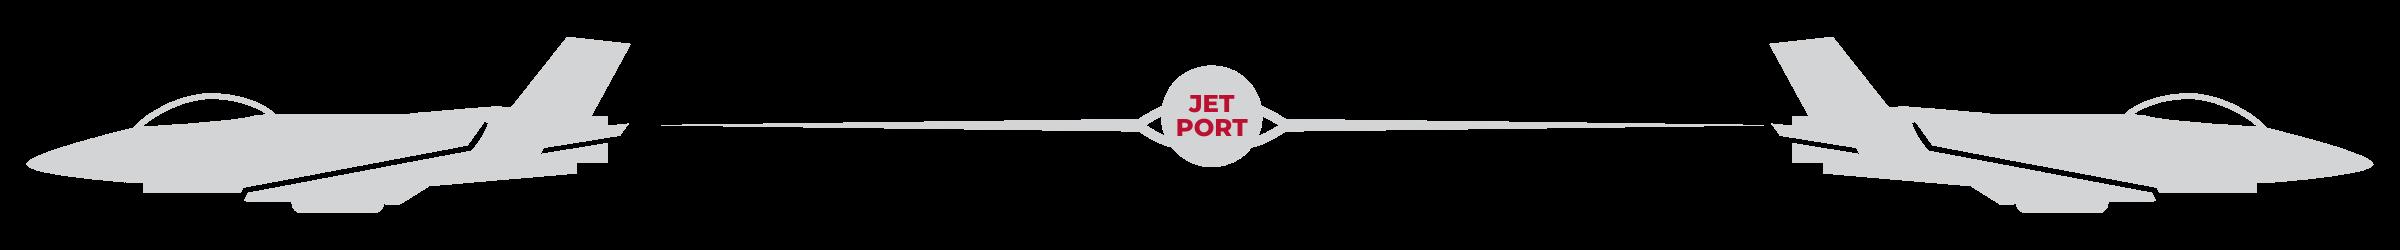 JetPort planes icon